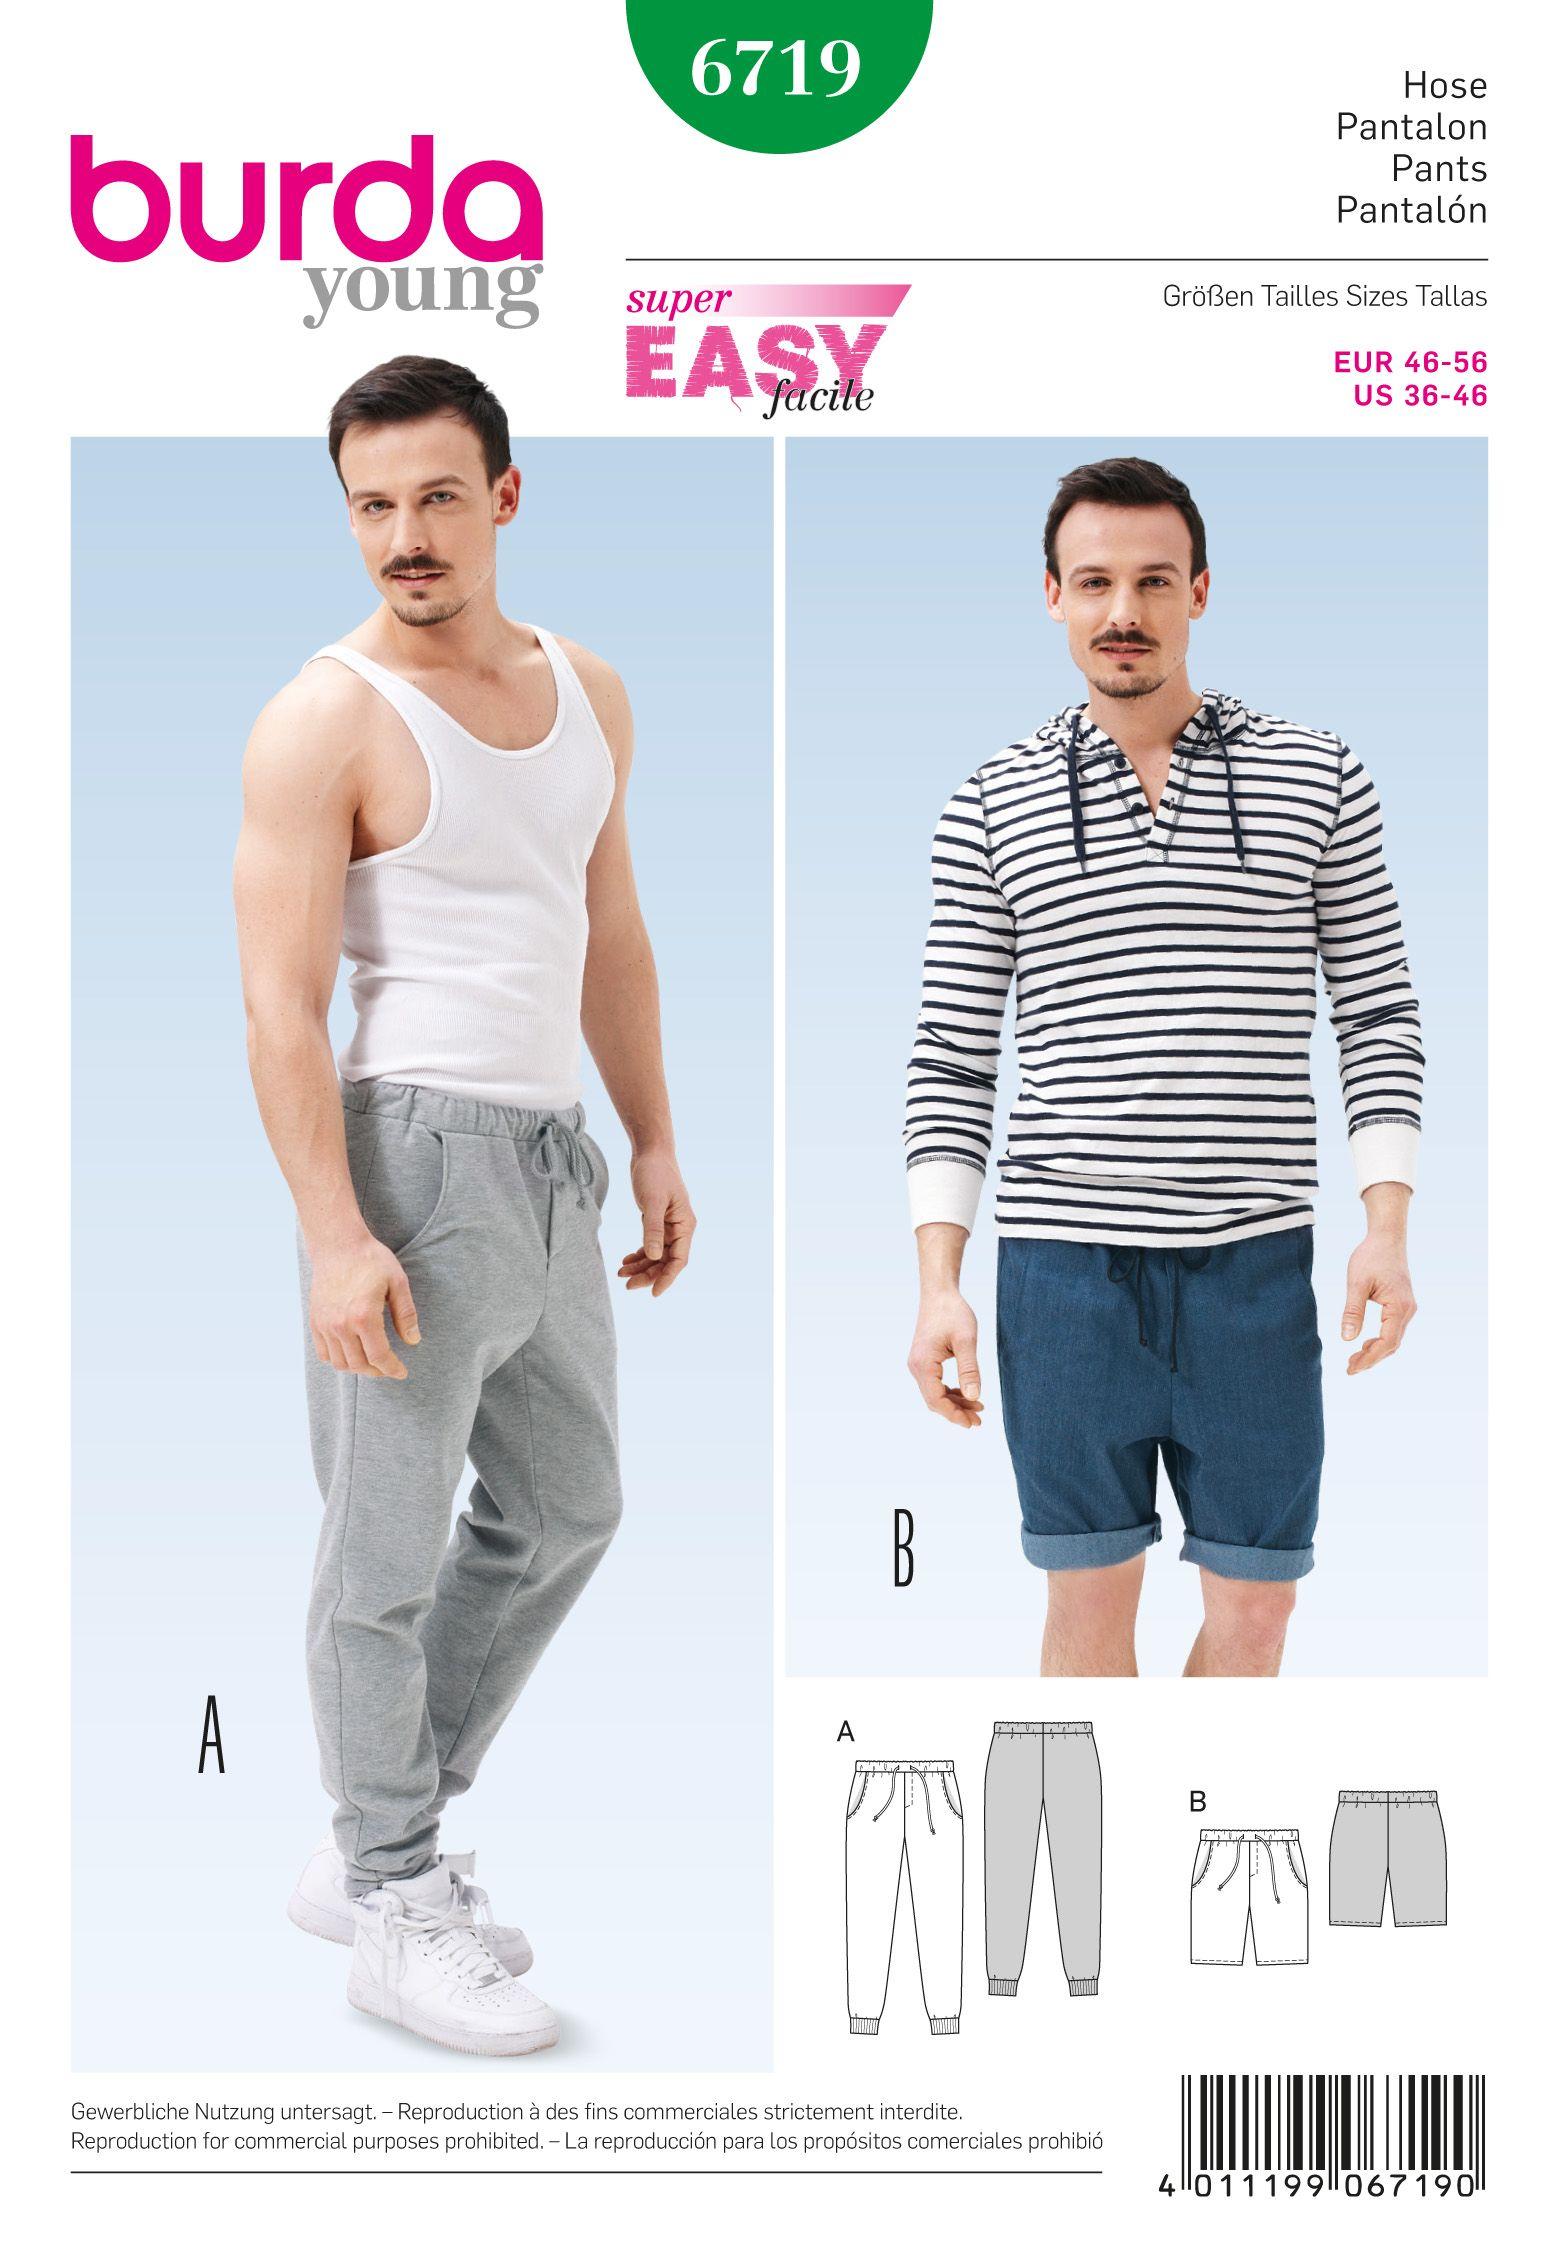 Burda 6719 Men\'s Jogging Pants | Jungs und Kleidung